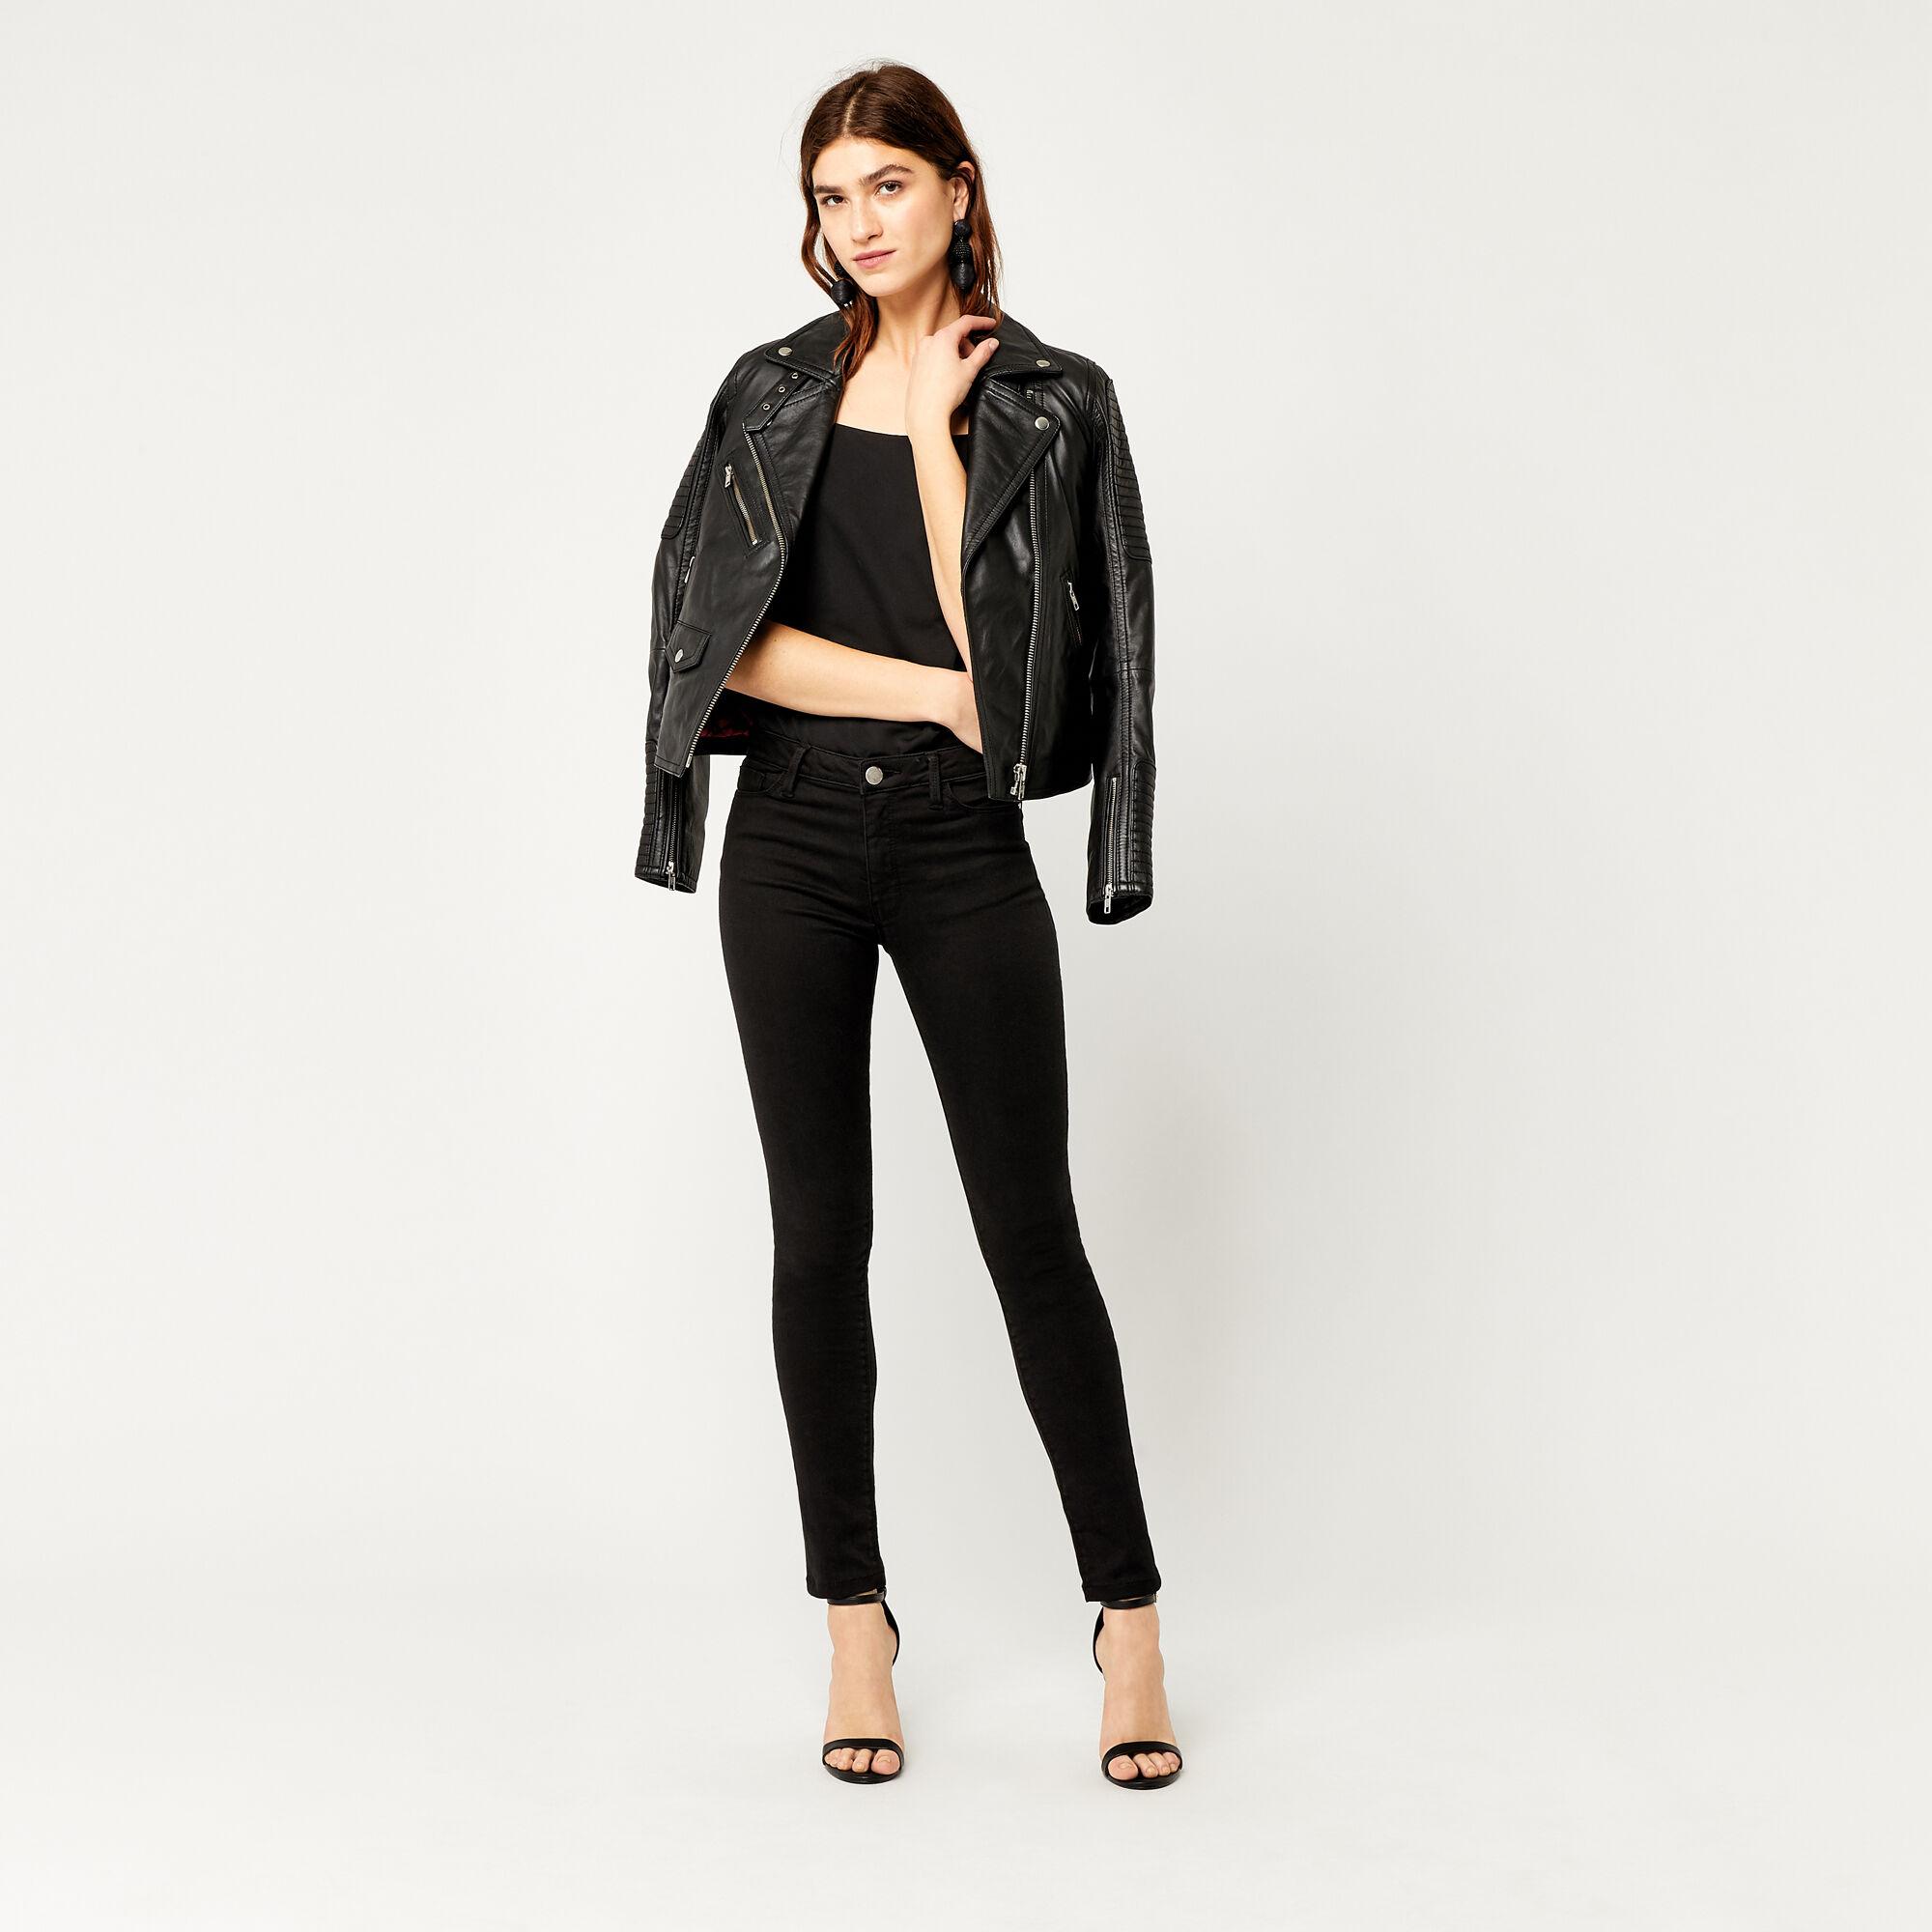 Warehouse, Powerhold Skinny Cut Jeans Black 1